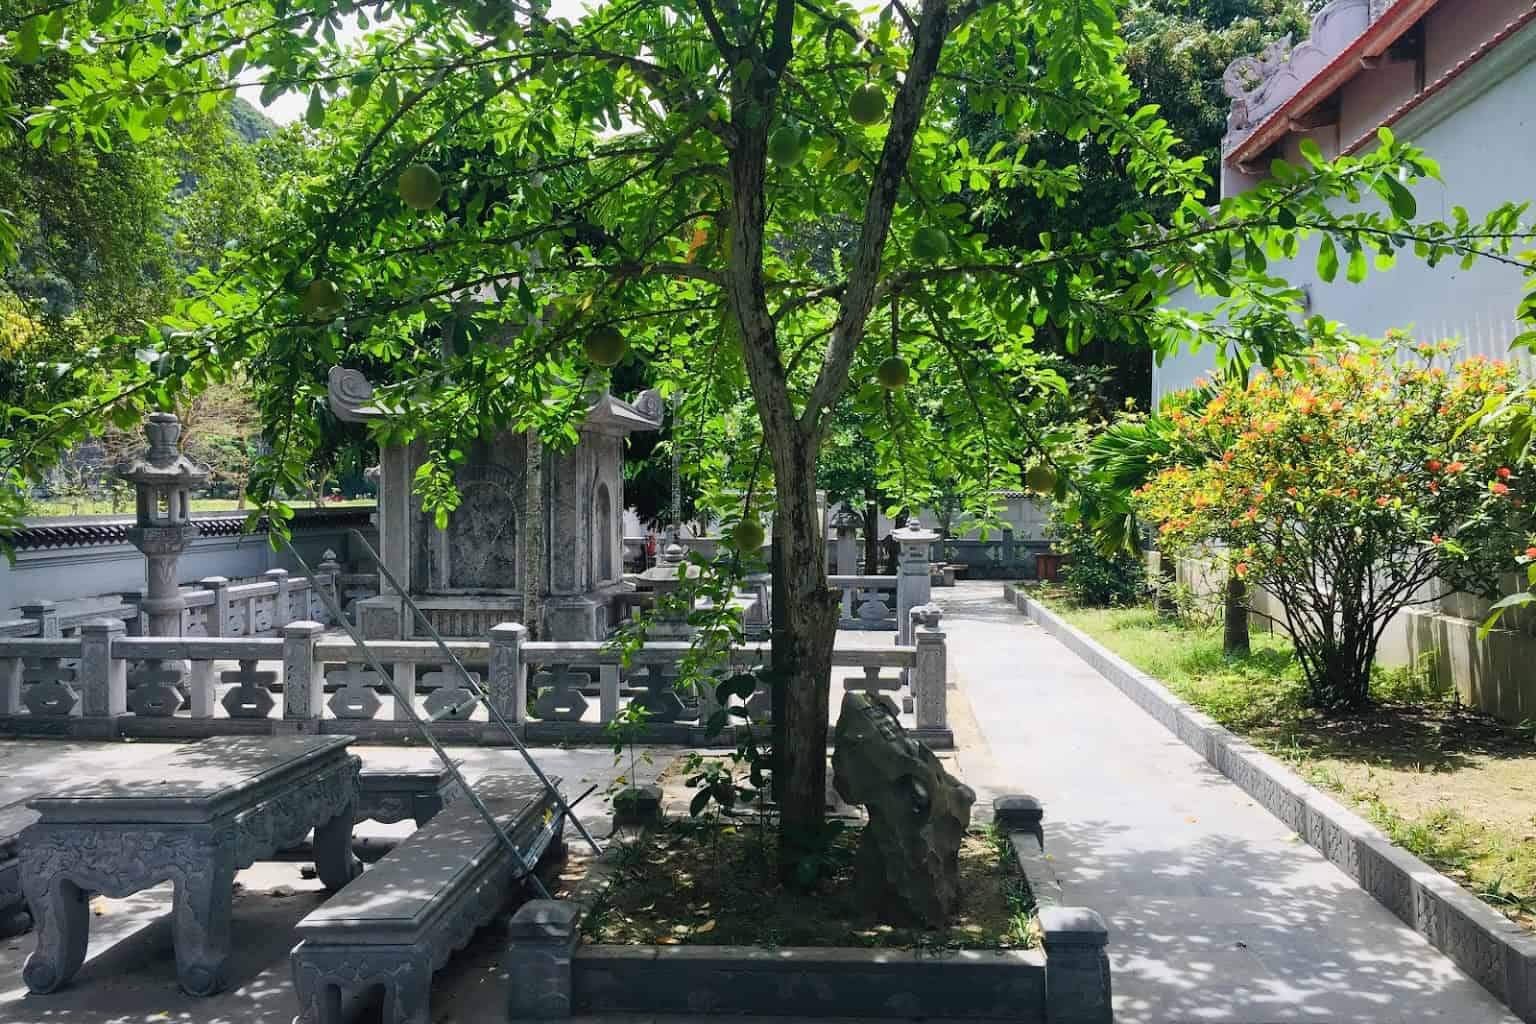 Inside Thai Vi temple